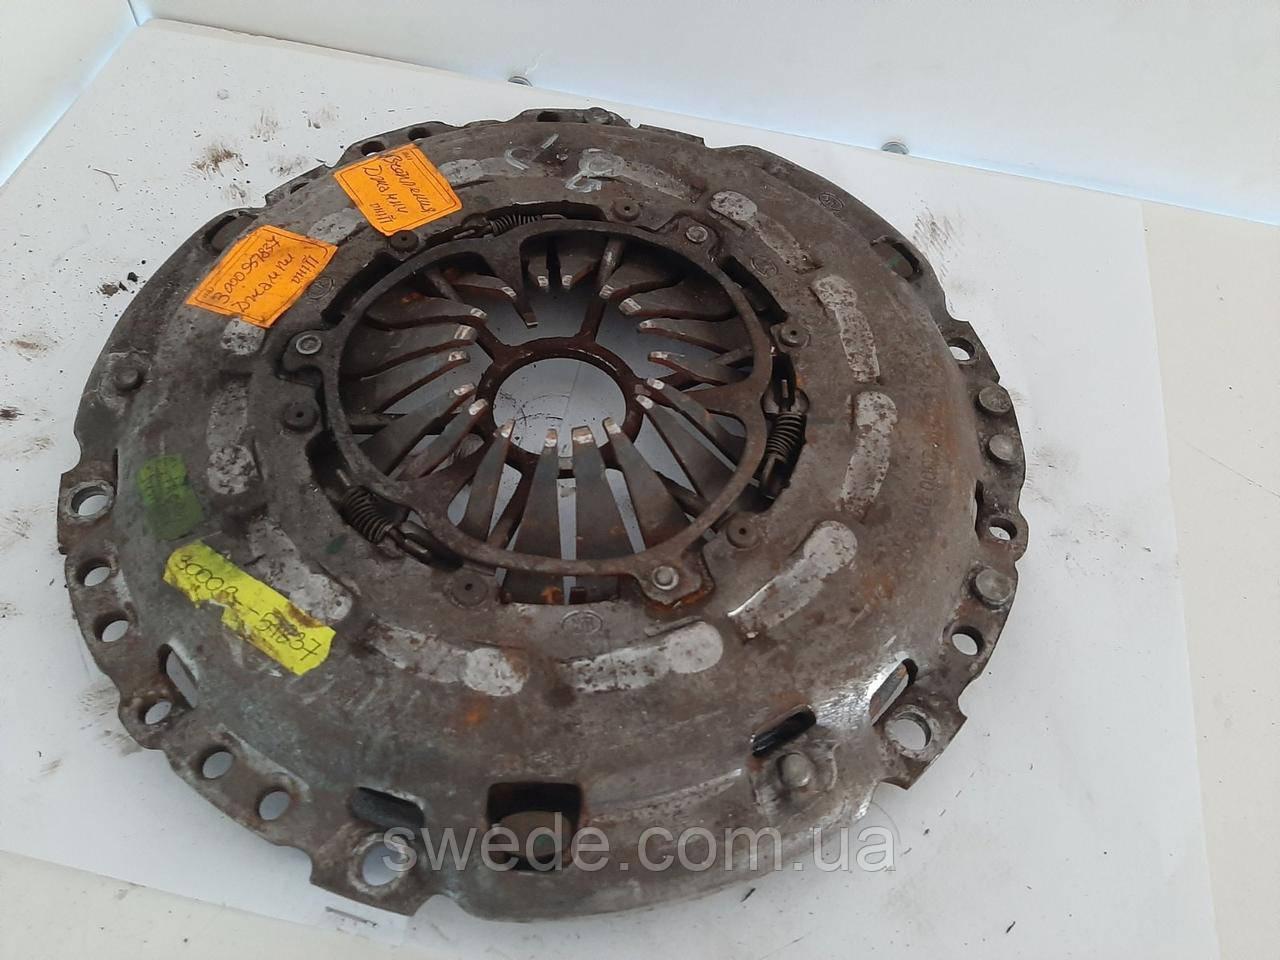 Корзина сцепления Citroen Jumpy 2.0 HDI 2007-2016 гг 3000951837